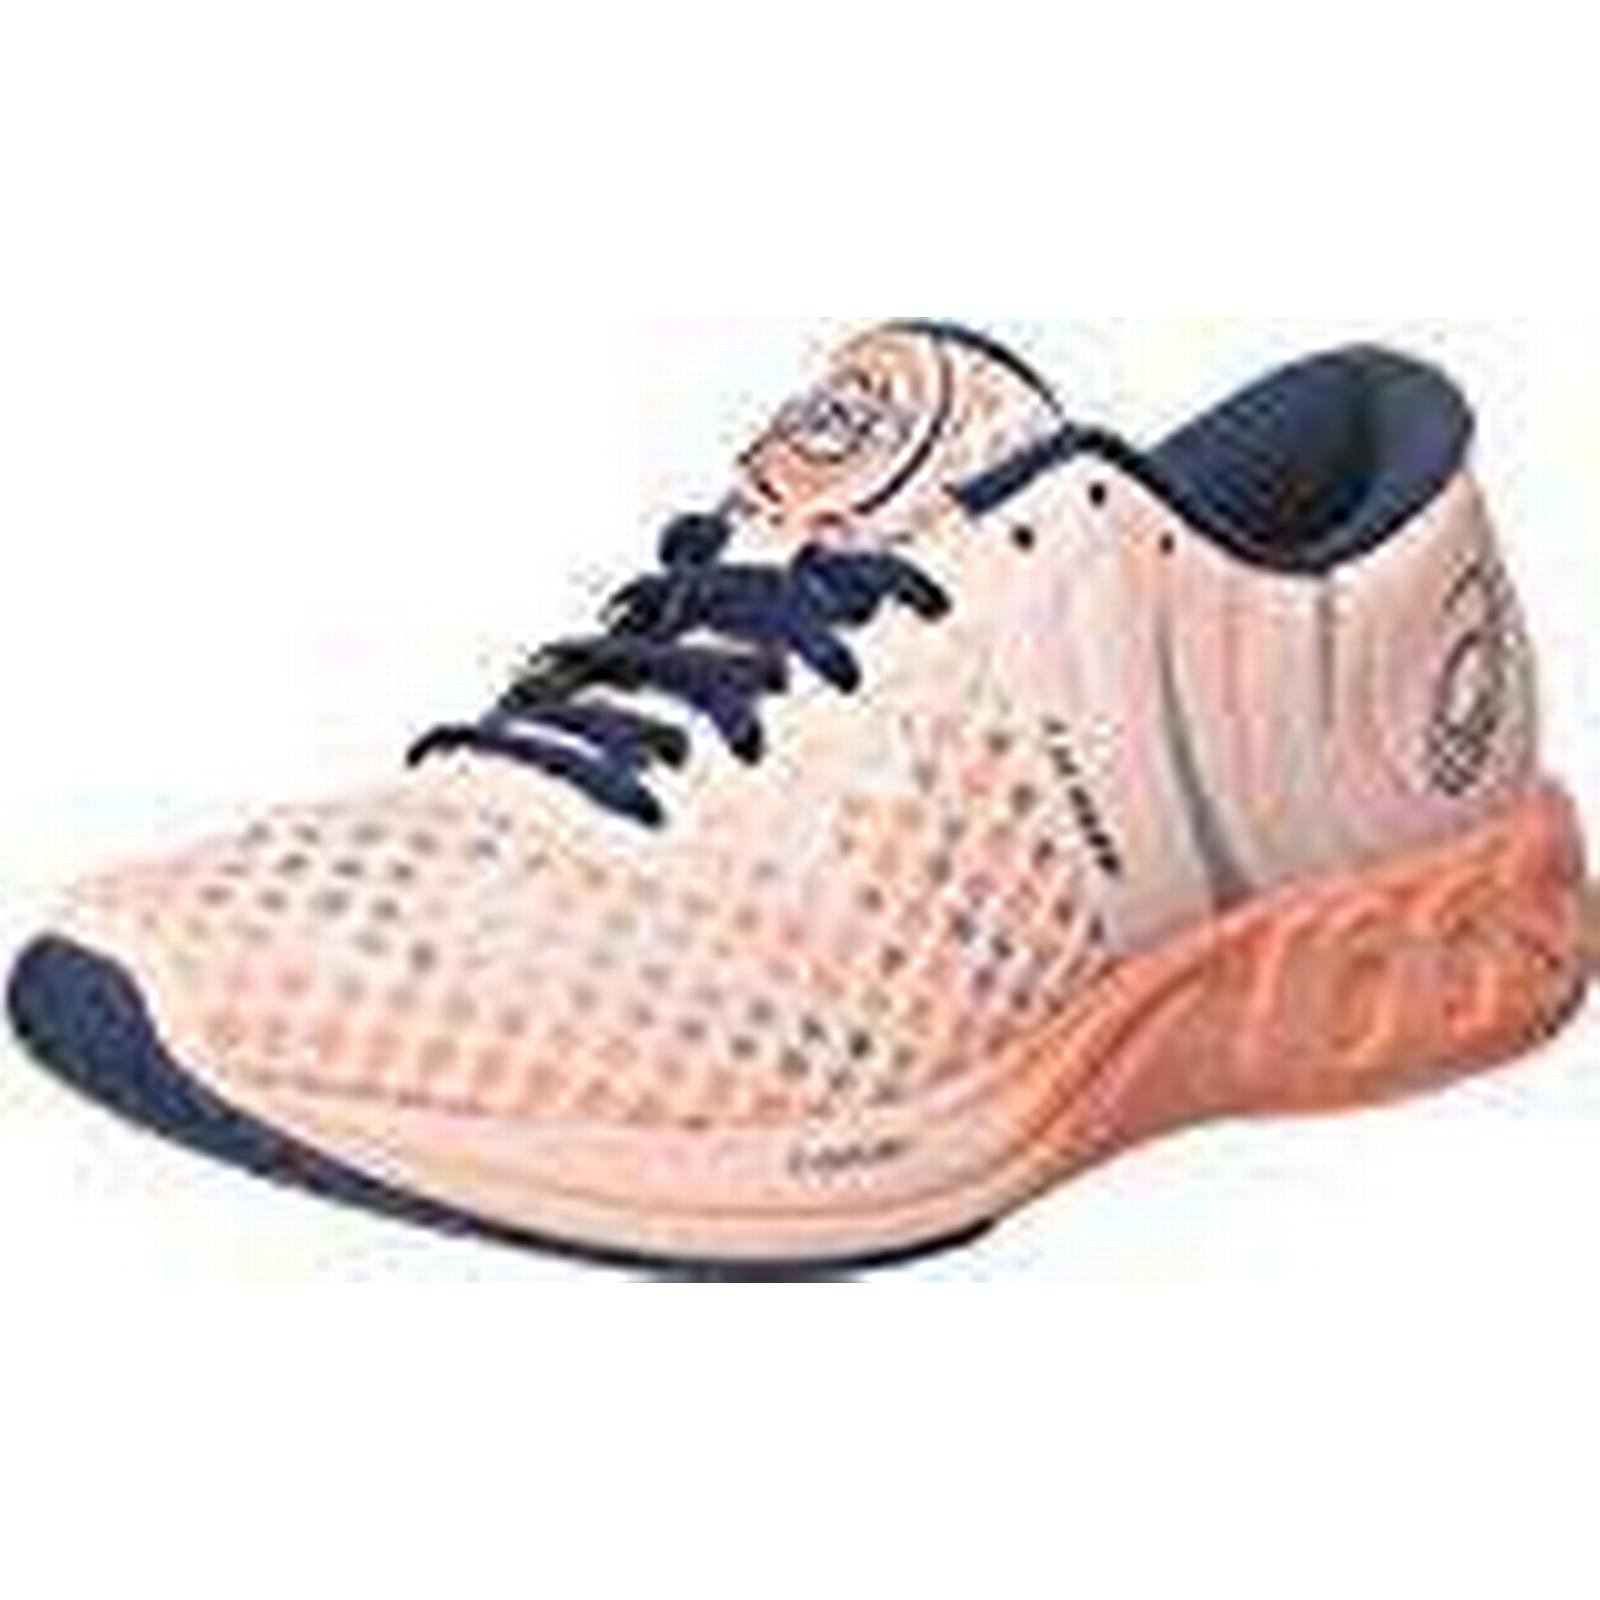 Asics Women''s Noosa Ff 2 Training Pink Shoes, (Seashell Dark Blue/Begonia Pink Training 1749), 37.5 EU (4.5 UK) f0c668